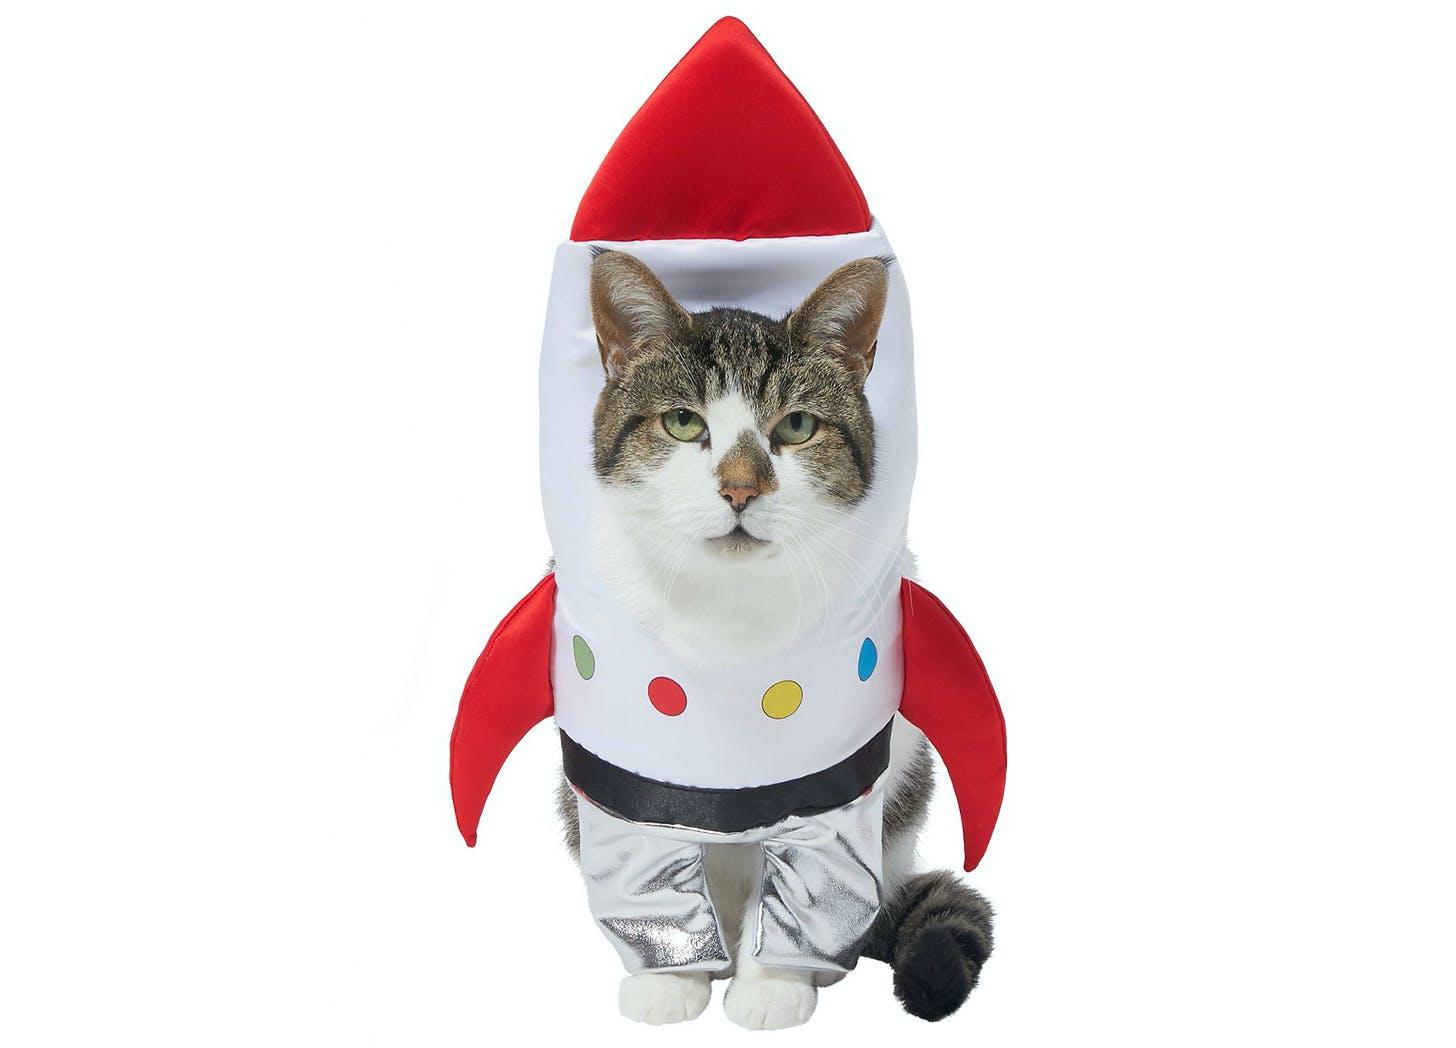 spaceship cat halloween costumes